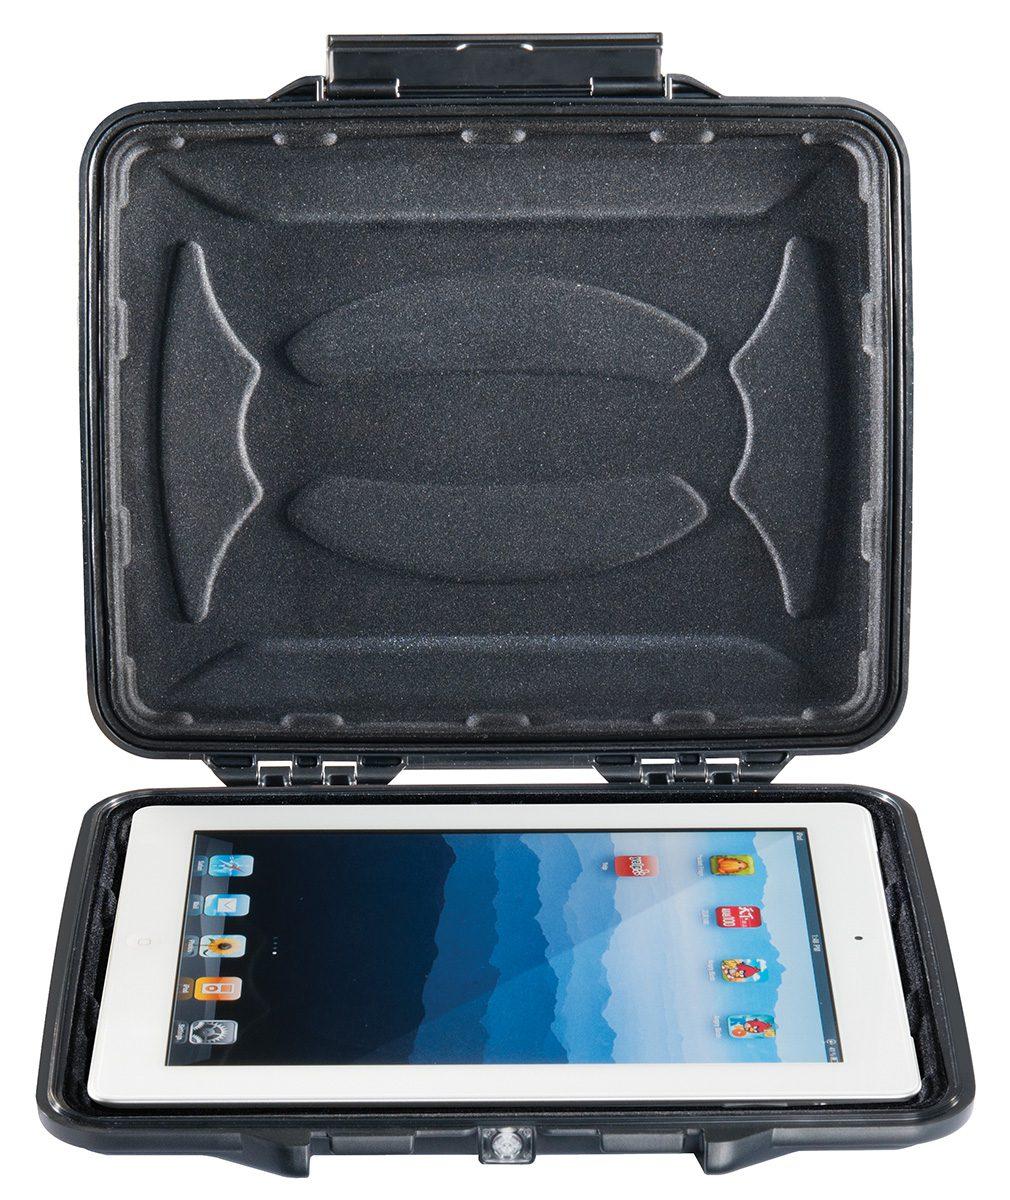 pelican-hard-waterproof-ipad-tablet-case